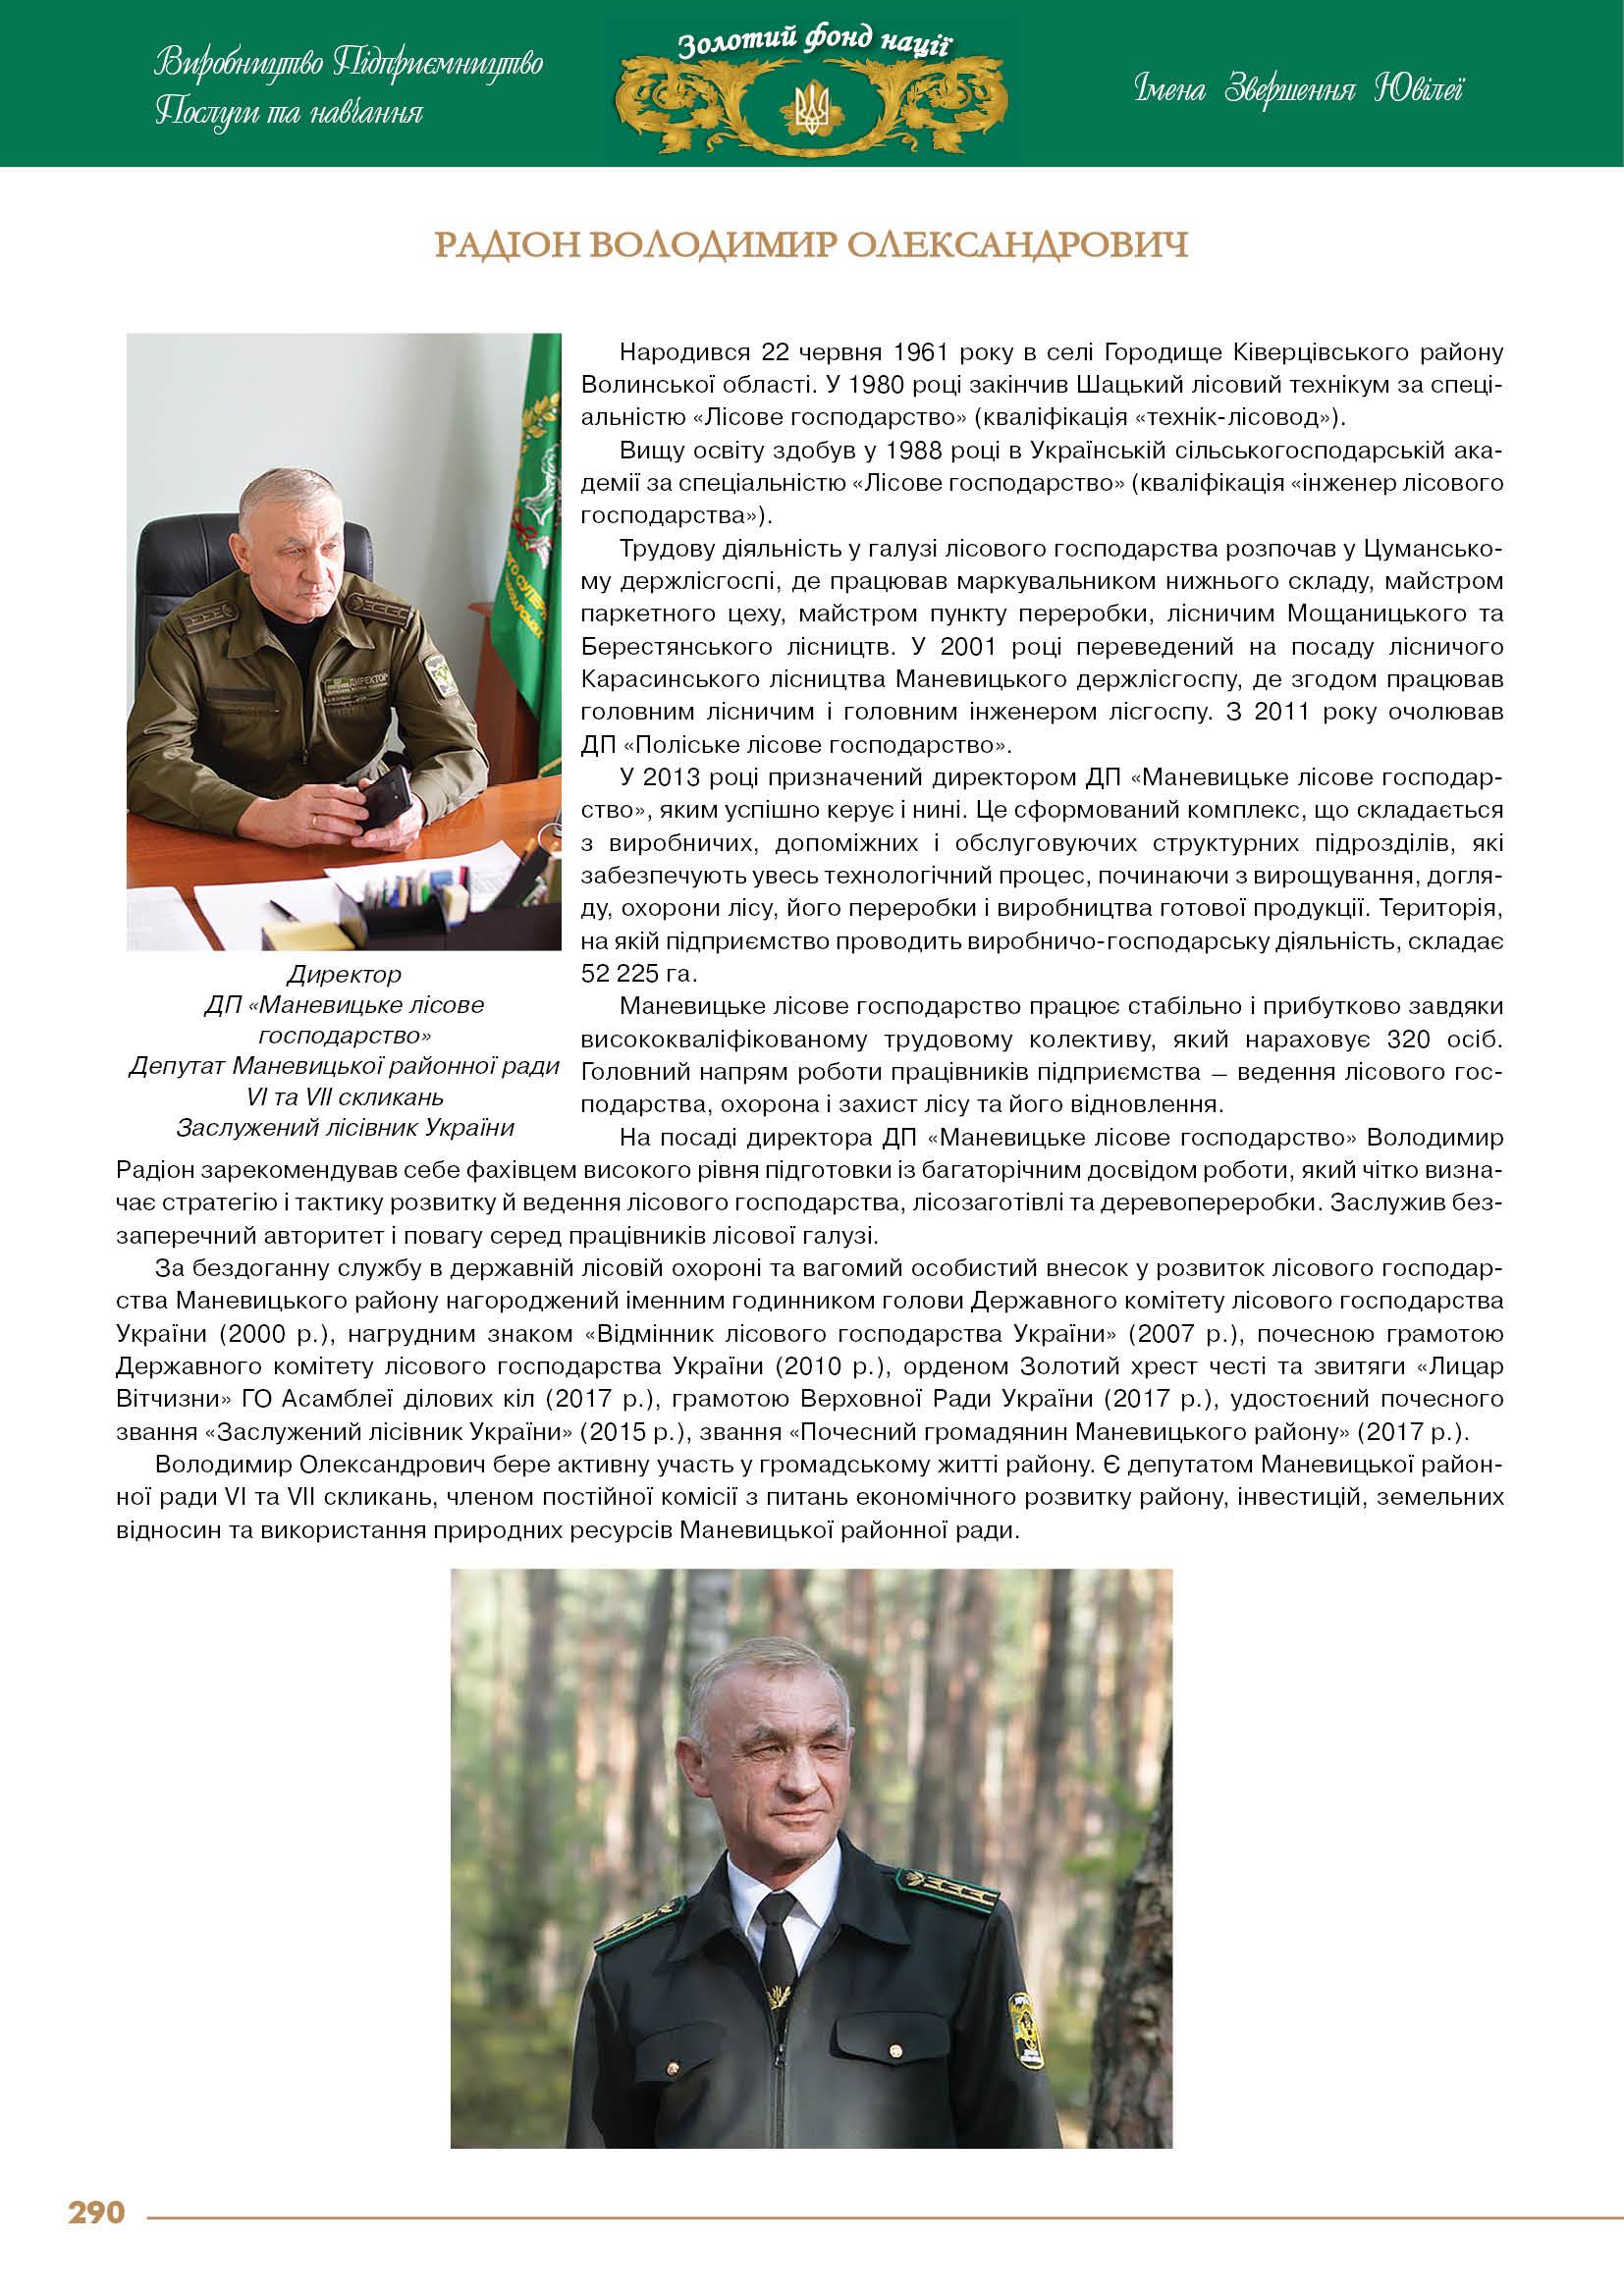 Радіон Володимир Олександрович